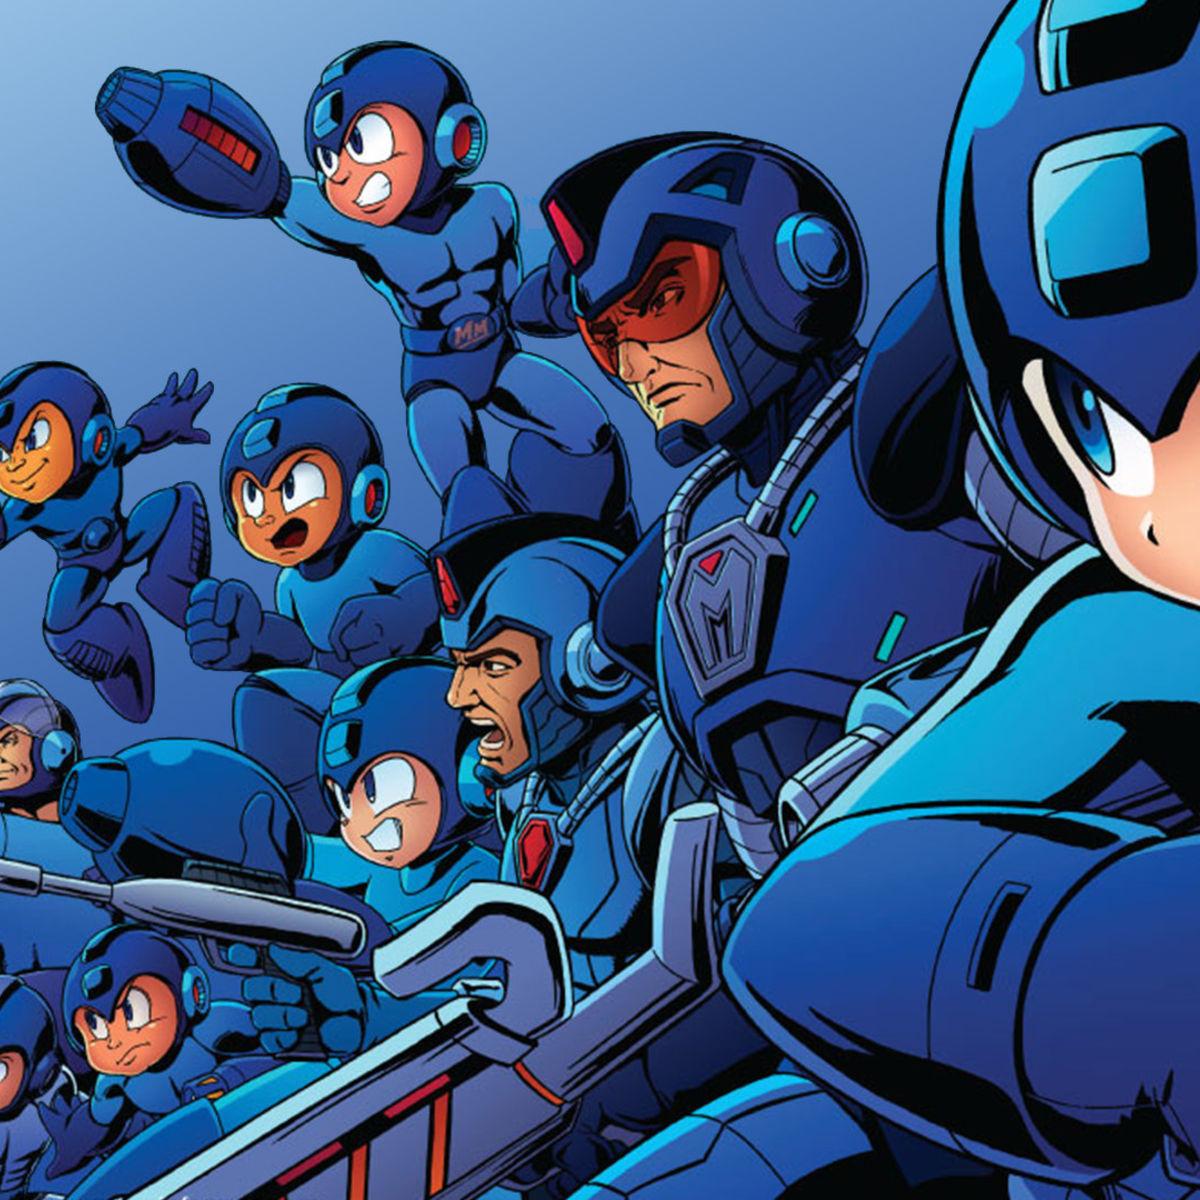 Nintendo Switch eShop Gets Mega Man 11 Demo